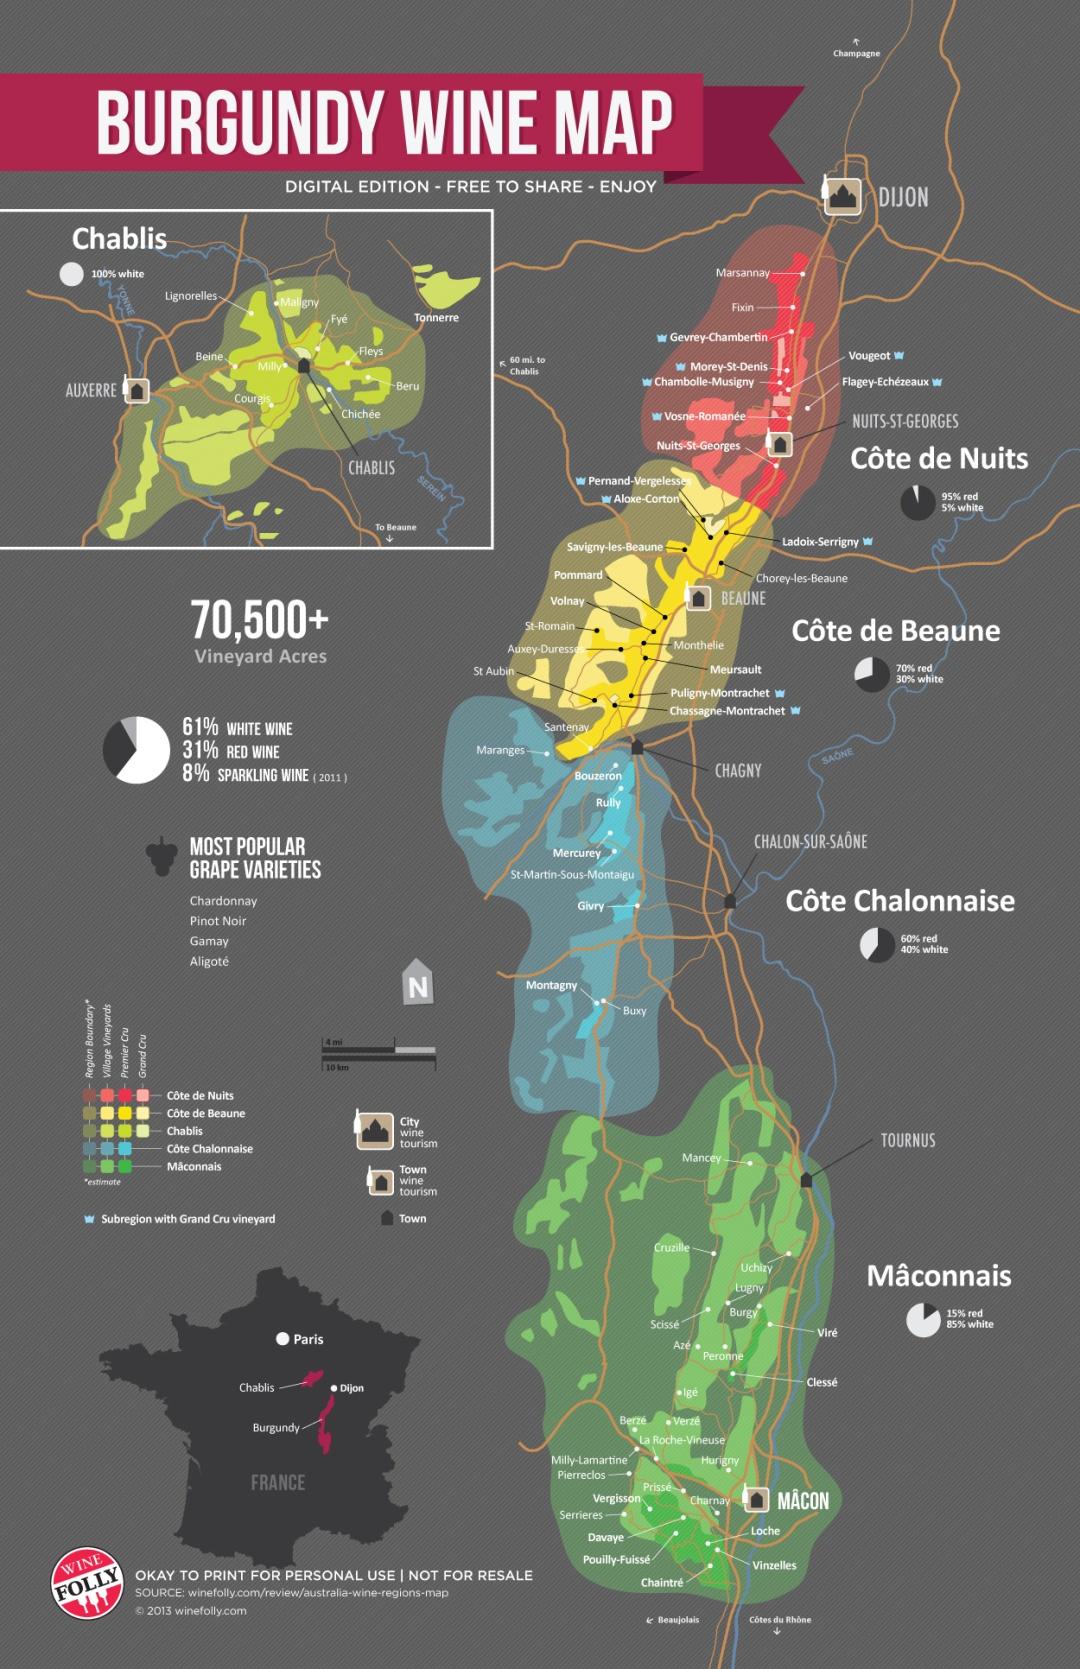 Burgundy-Wine-Map-wine-folly